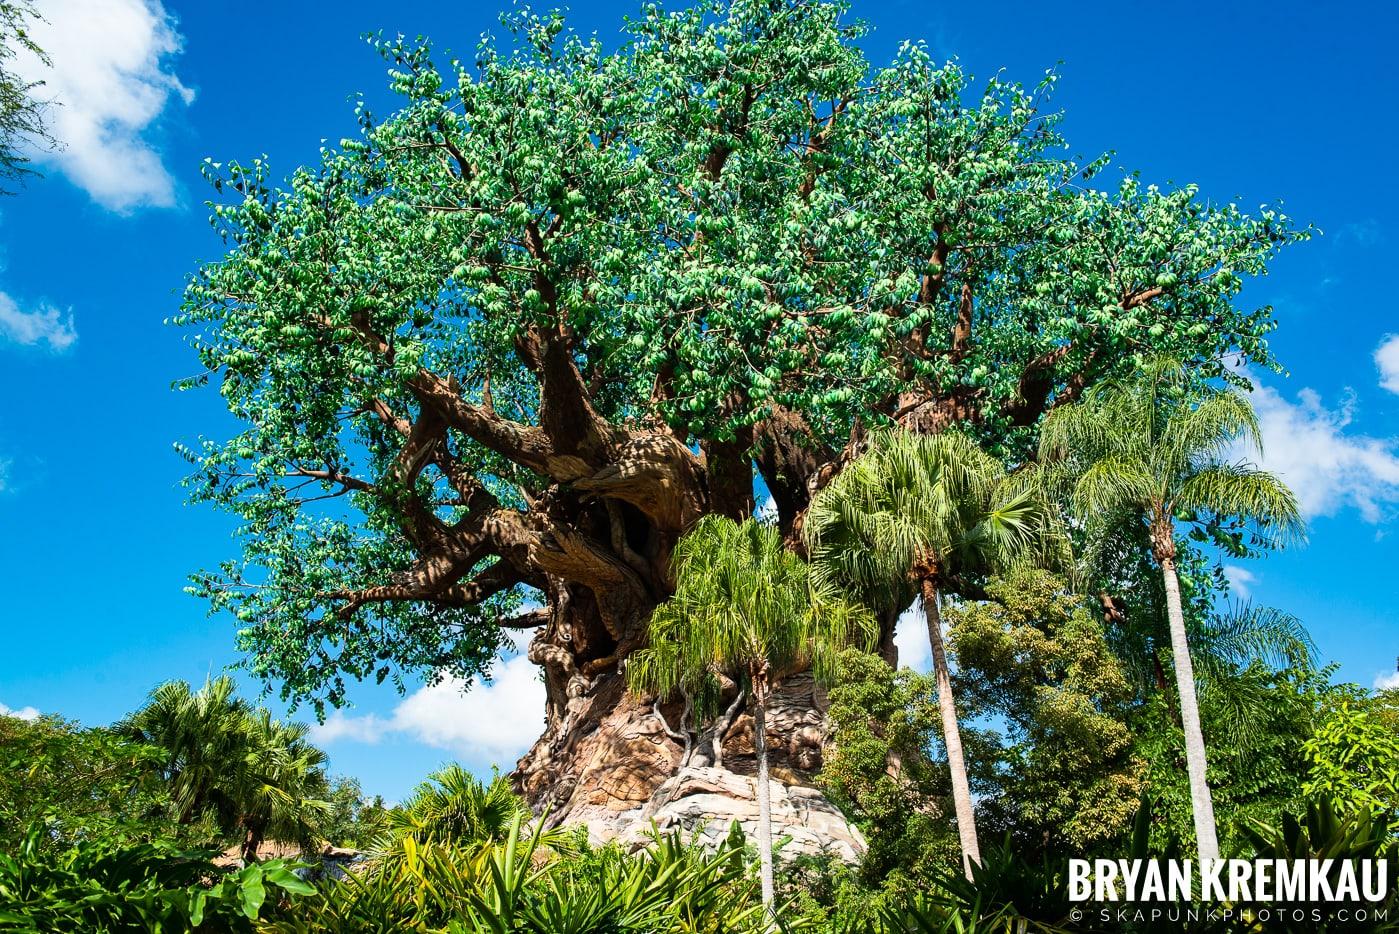 Walt Disney World Vacation: Day 5 (Animal Kingdom / Disney's Hollywood Studios) - 10.3.19 (57)